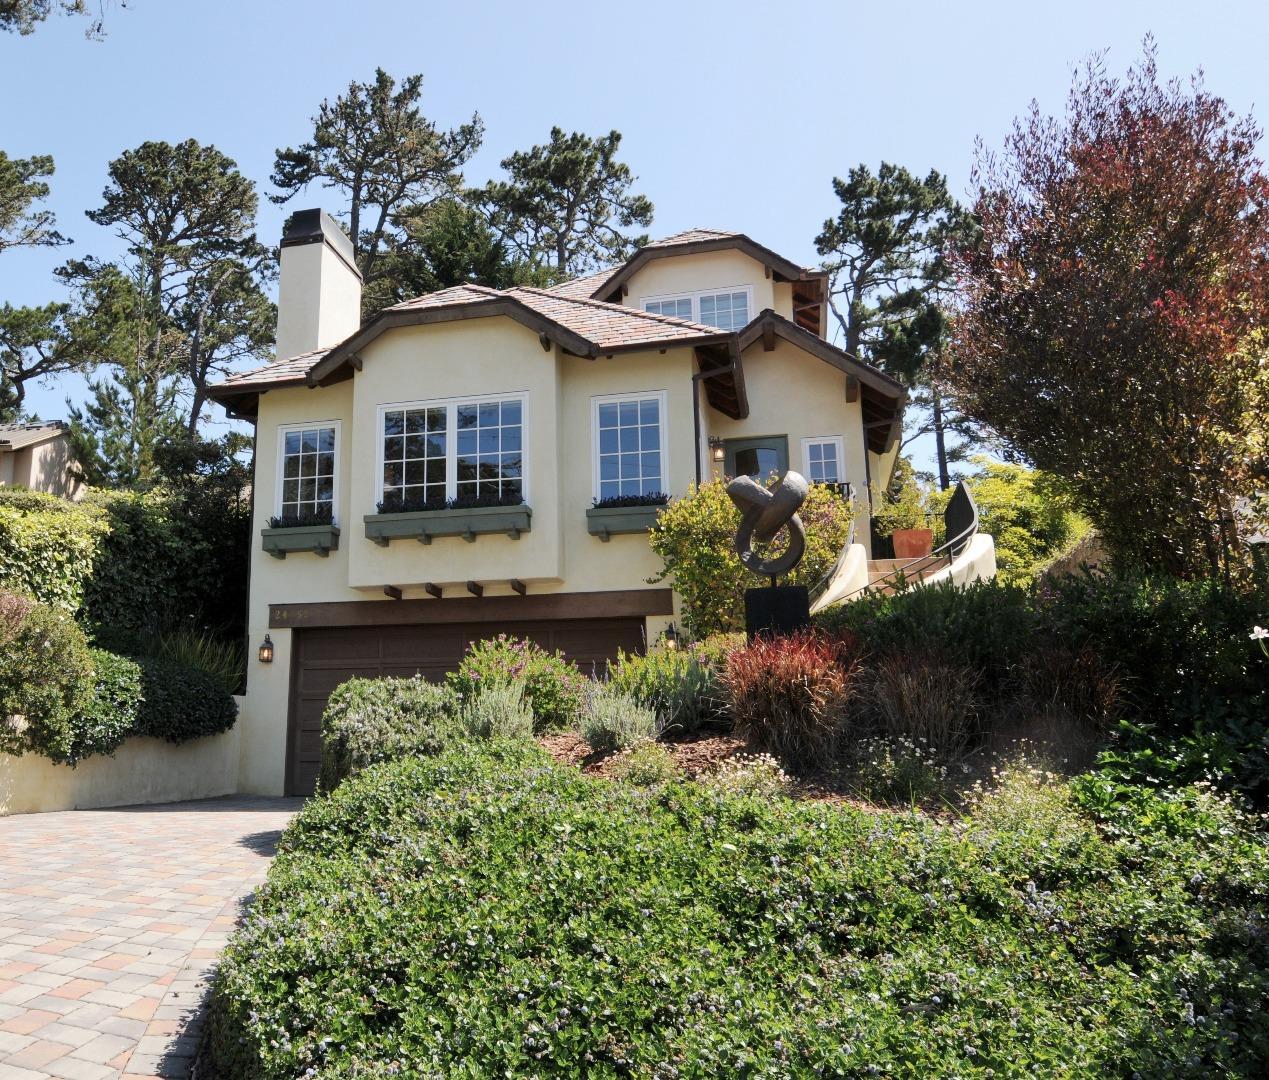 24759 Dolores St, Carmel, CA